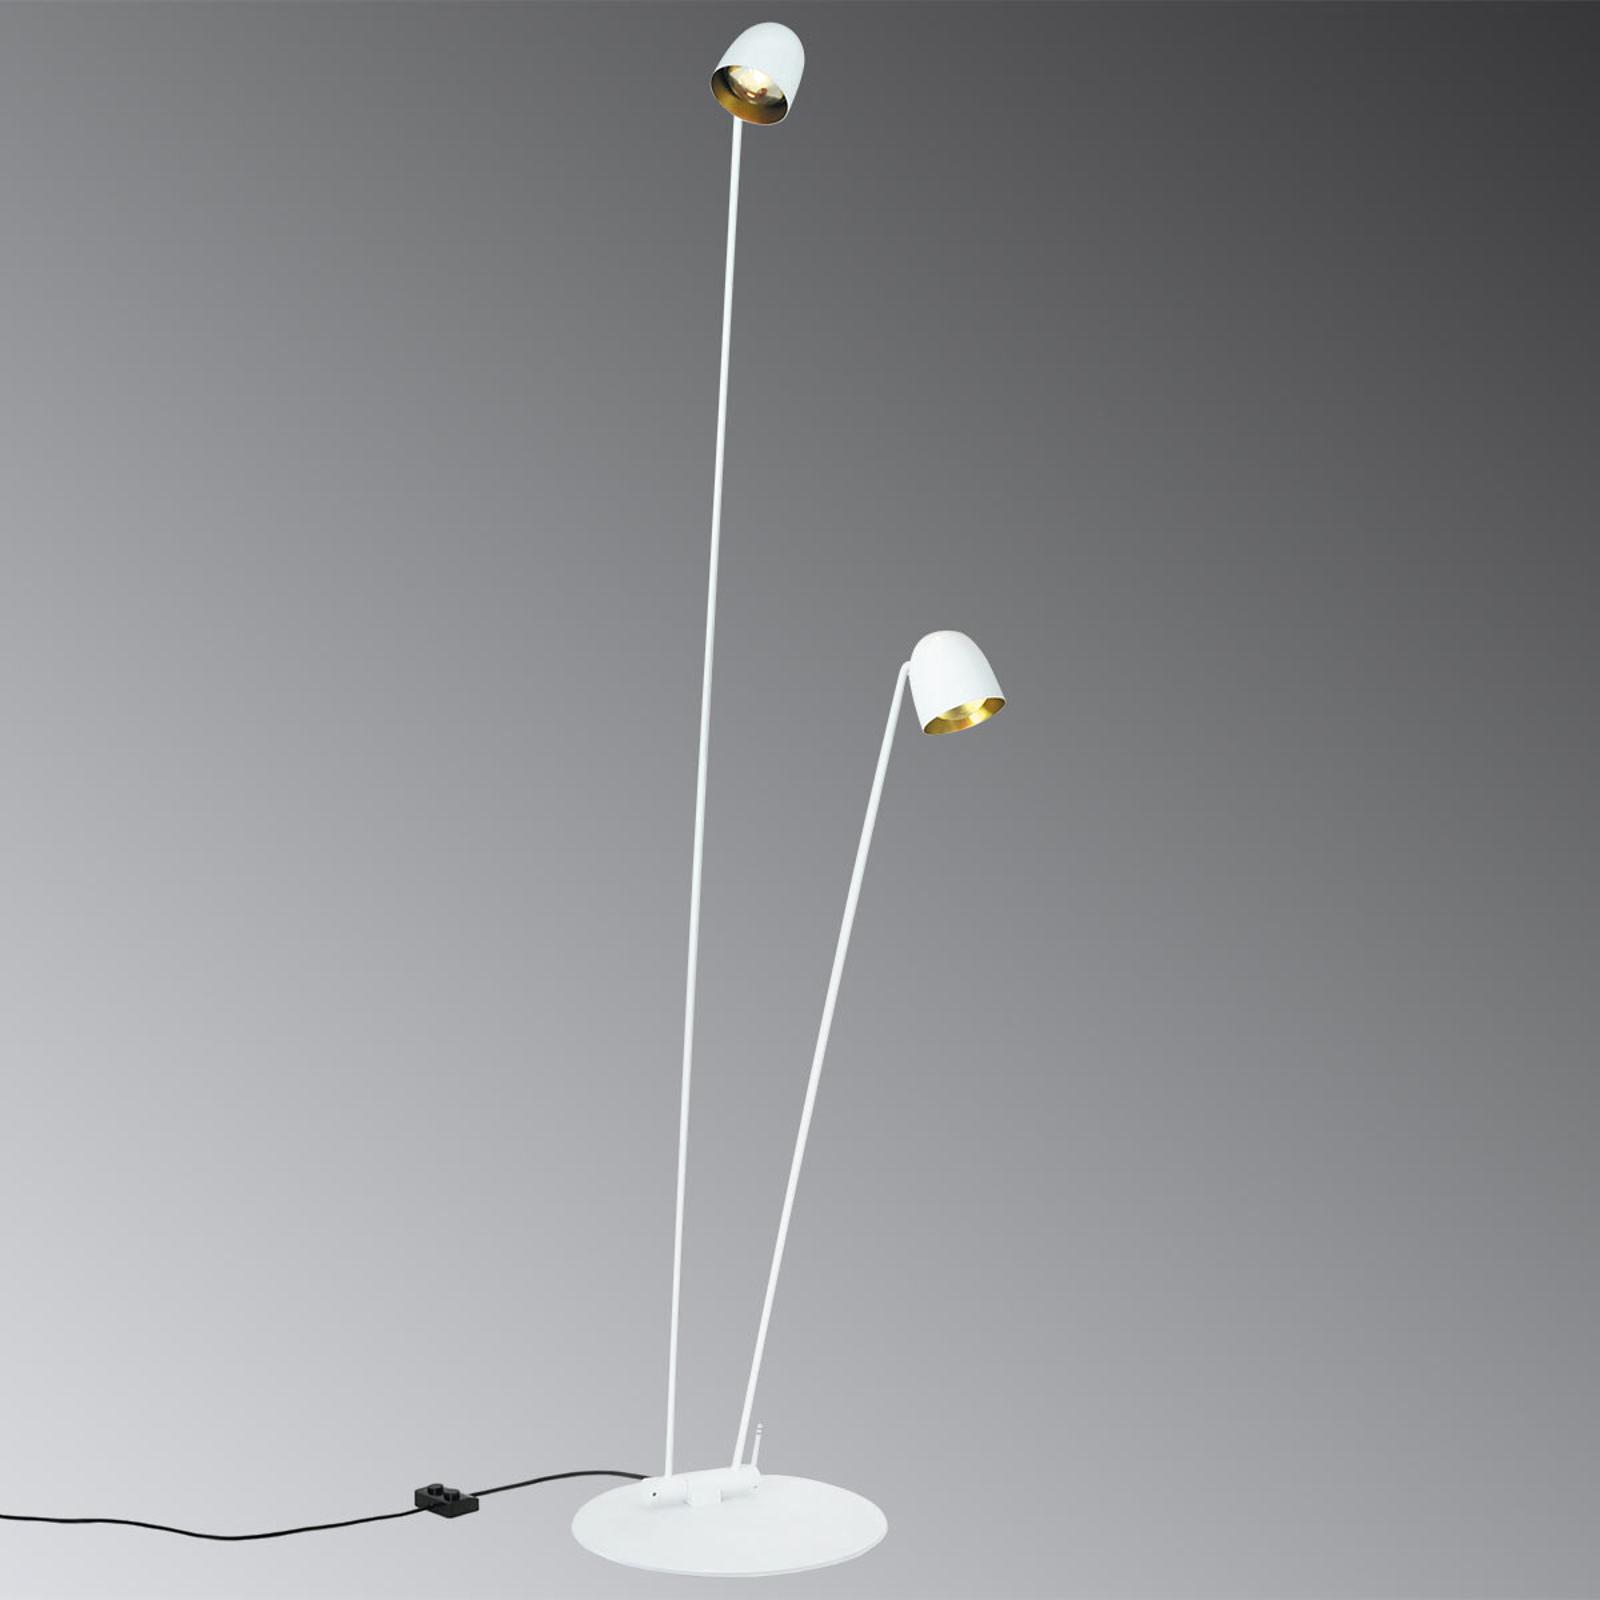 Regulowana lampa stojąca LED Speers F, biała